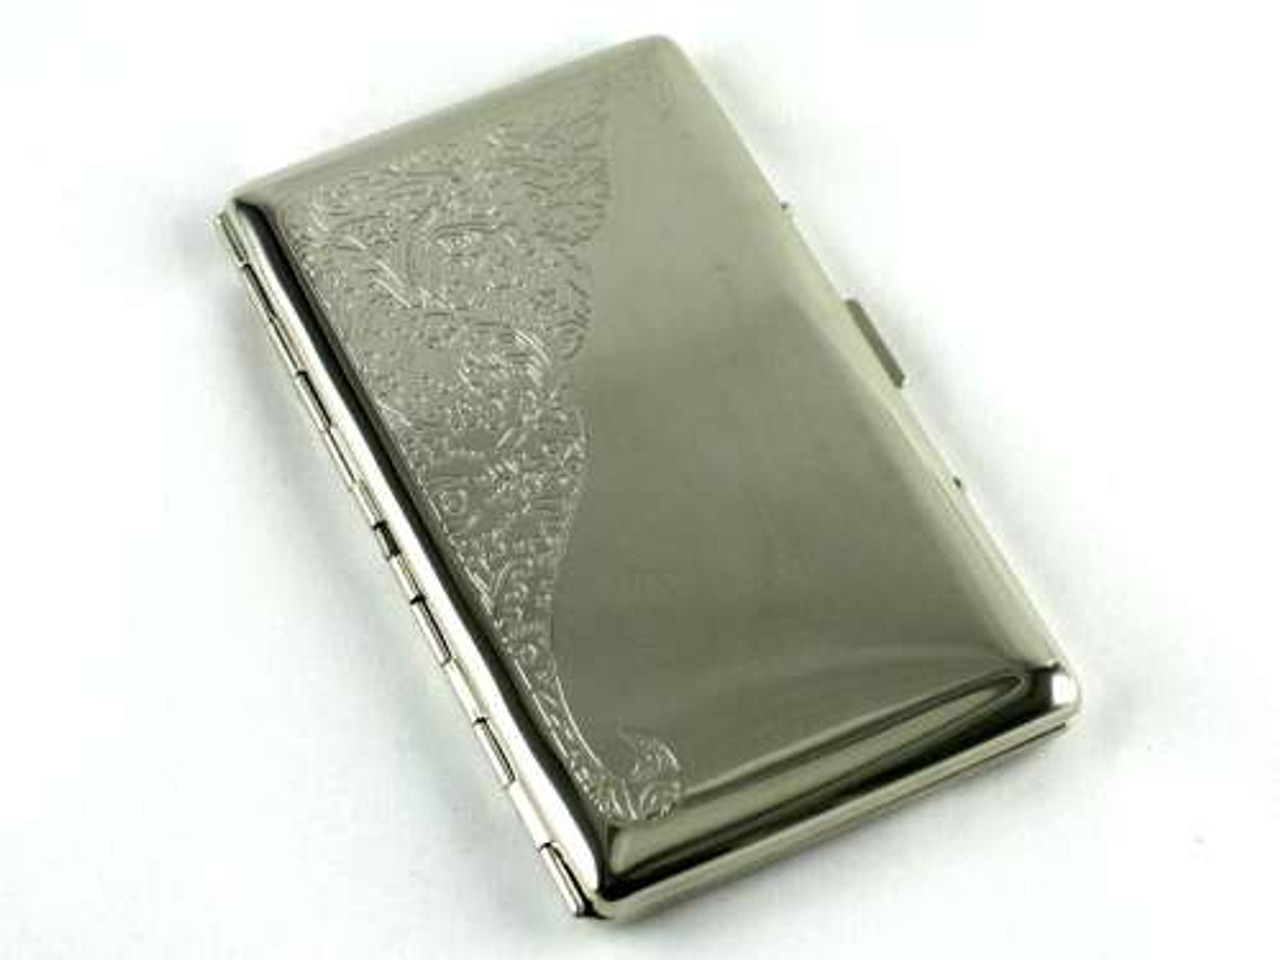 Lucienne Silver Etched Cigarette Case